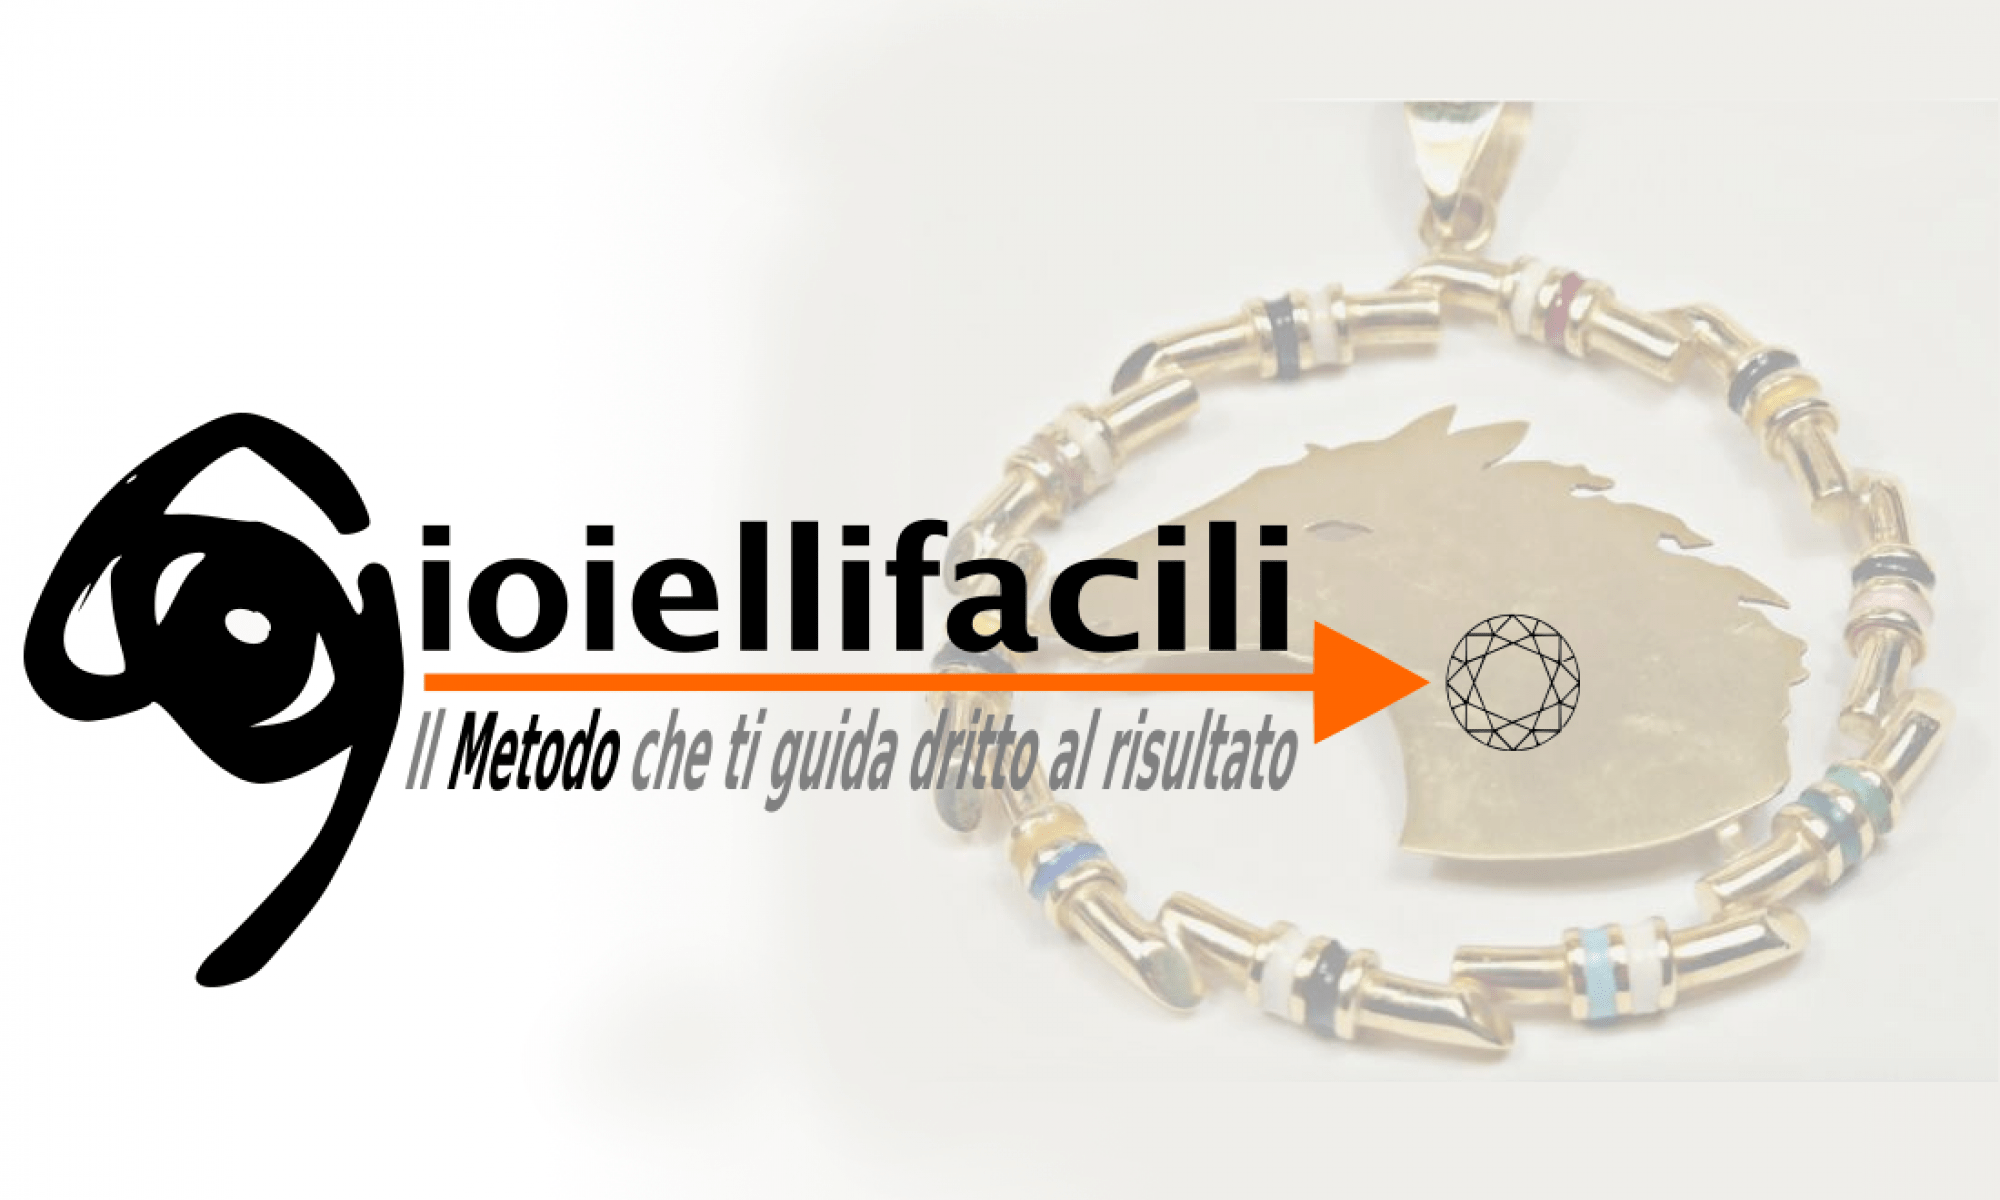 gioiellifacili.it